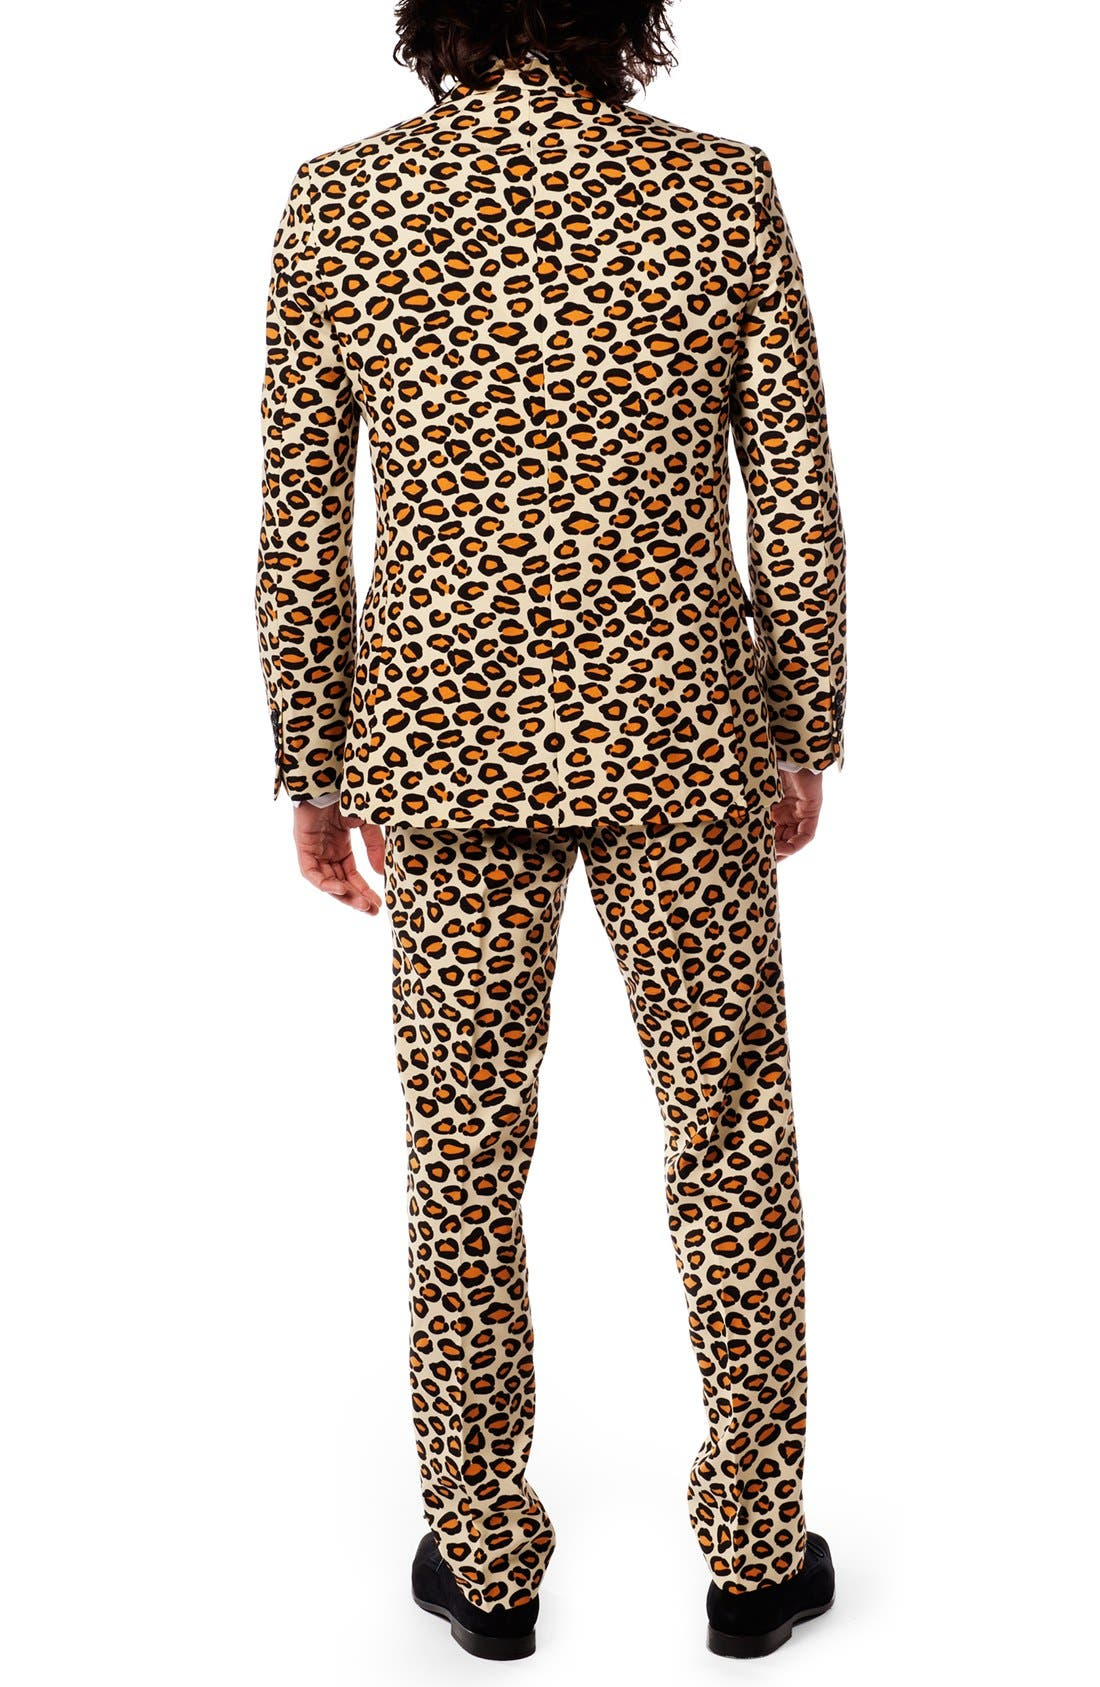 'The Jag' Trim Fit Two-Piece Suit with Tie,                             Alternate thumbnail 2, color,                             Dark Beige